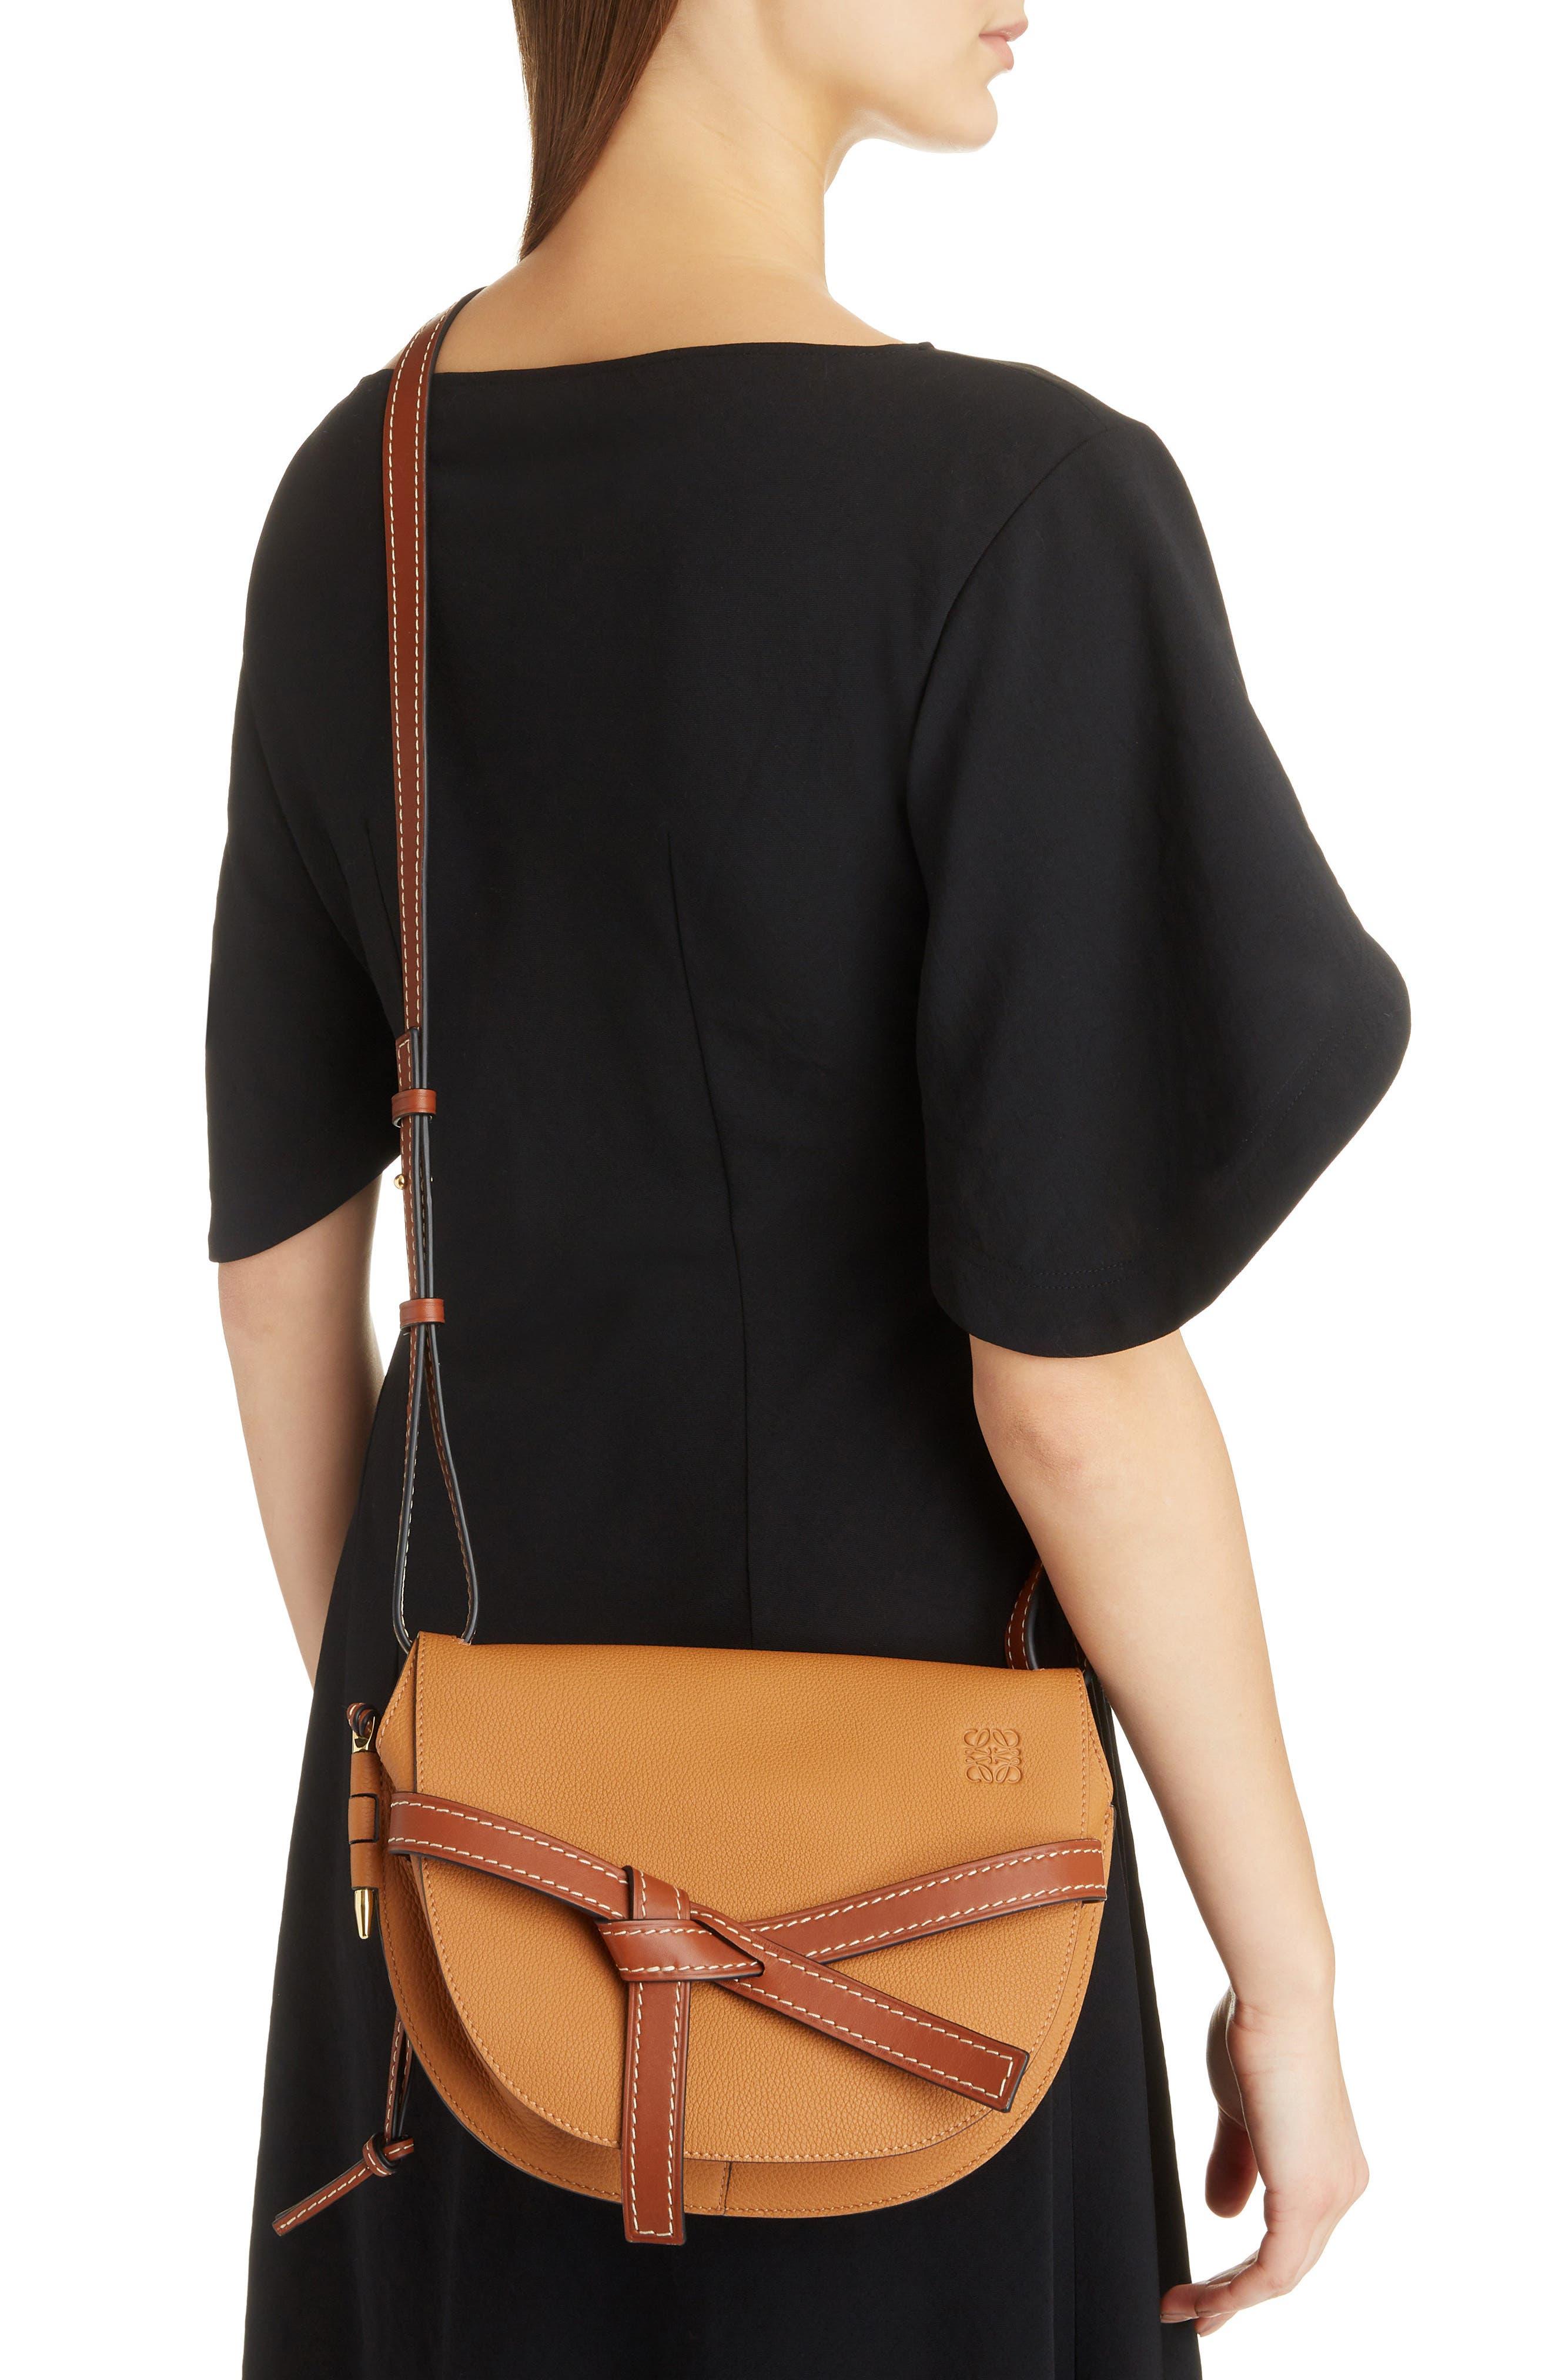 Small Gate Leather Crossbody Bag,                             Alternate thumbnail 2, color,                             LIGHT CARAMEL/ PECAN